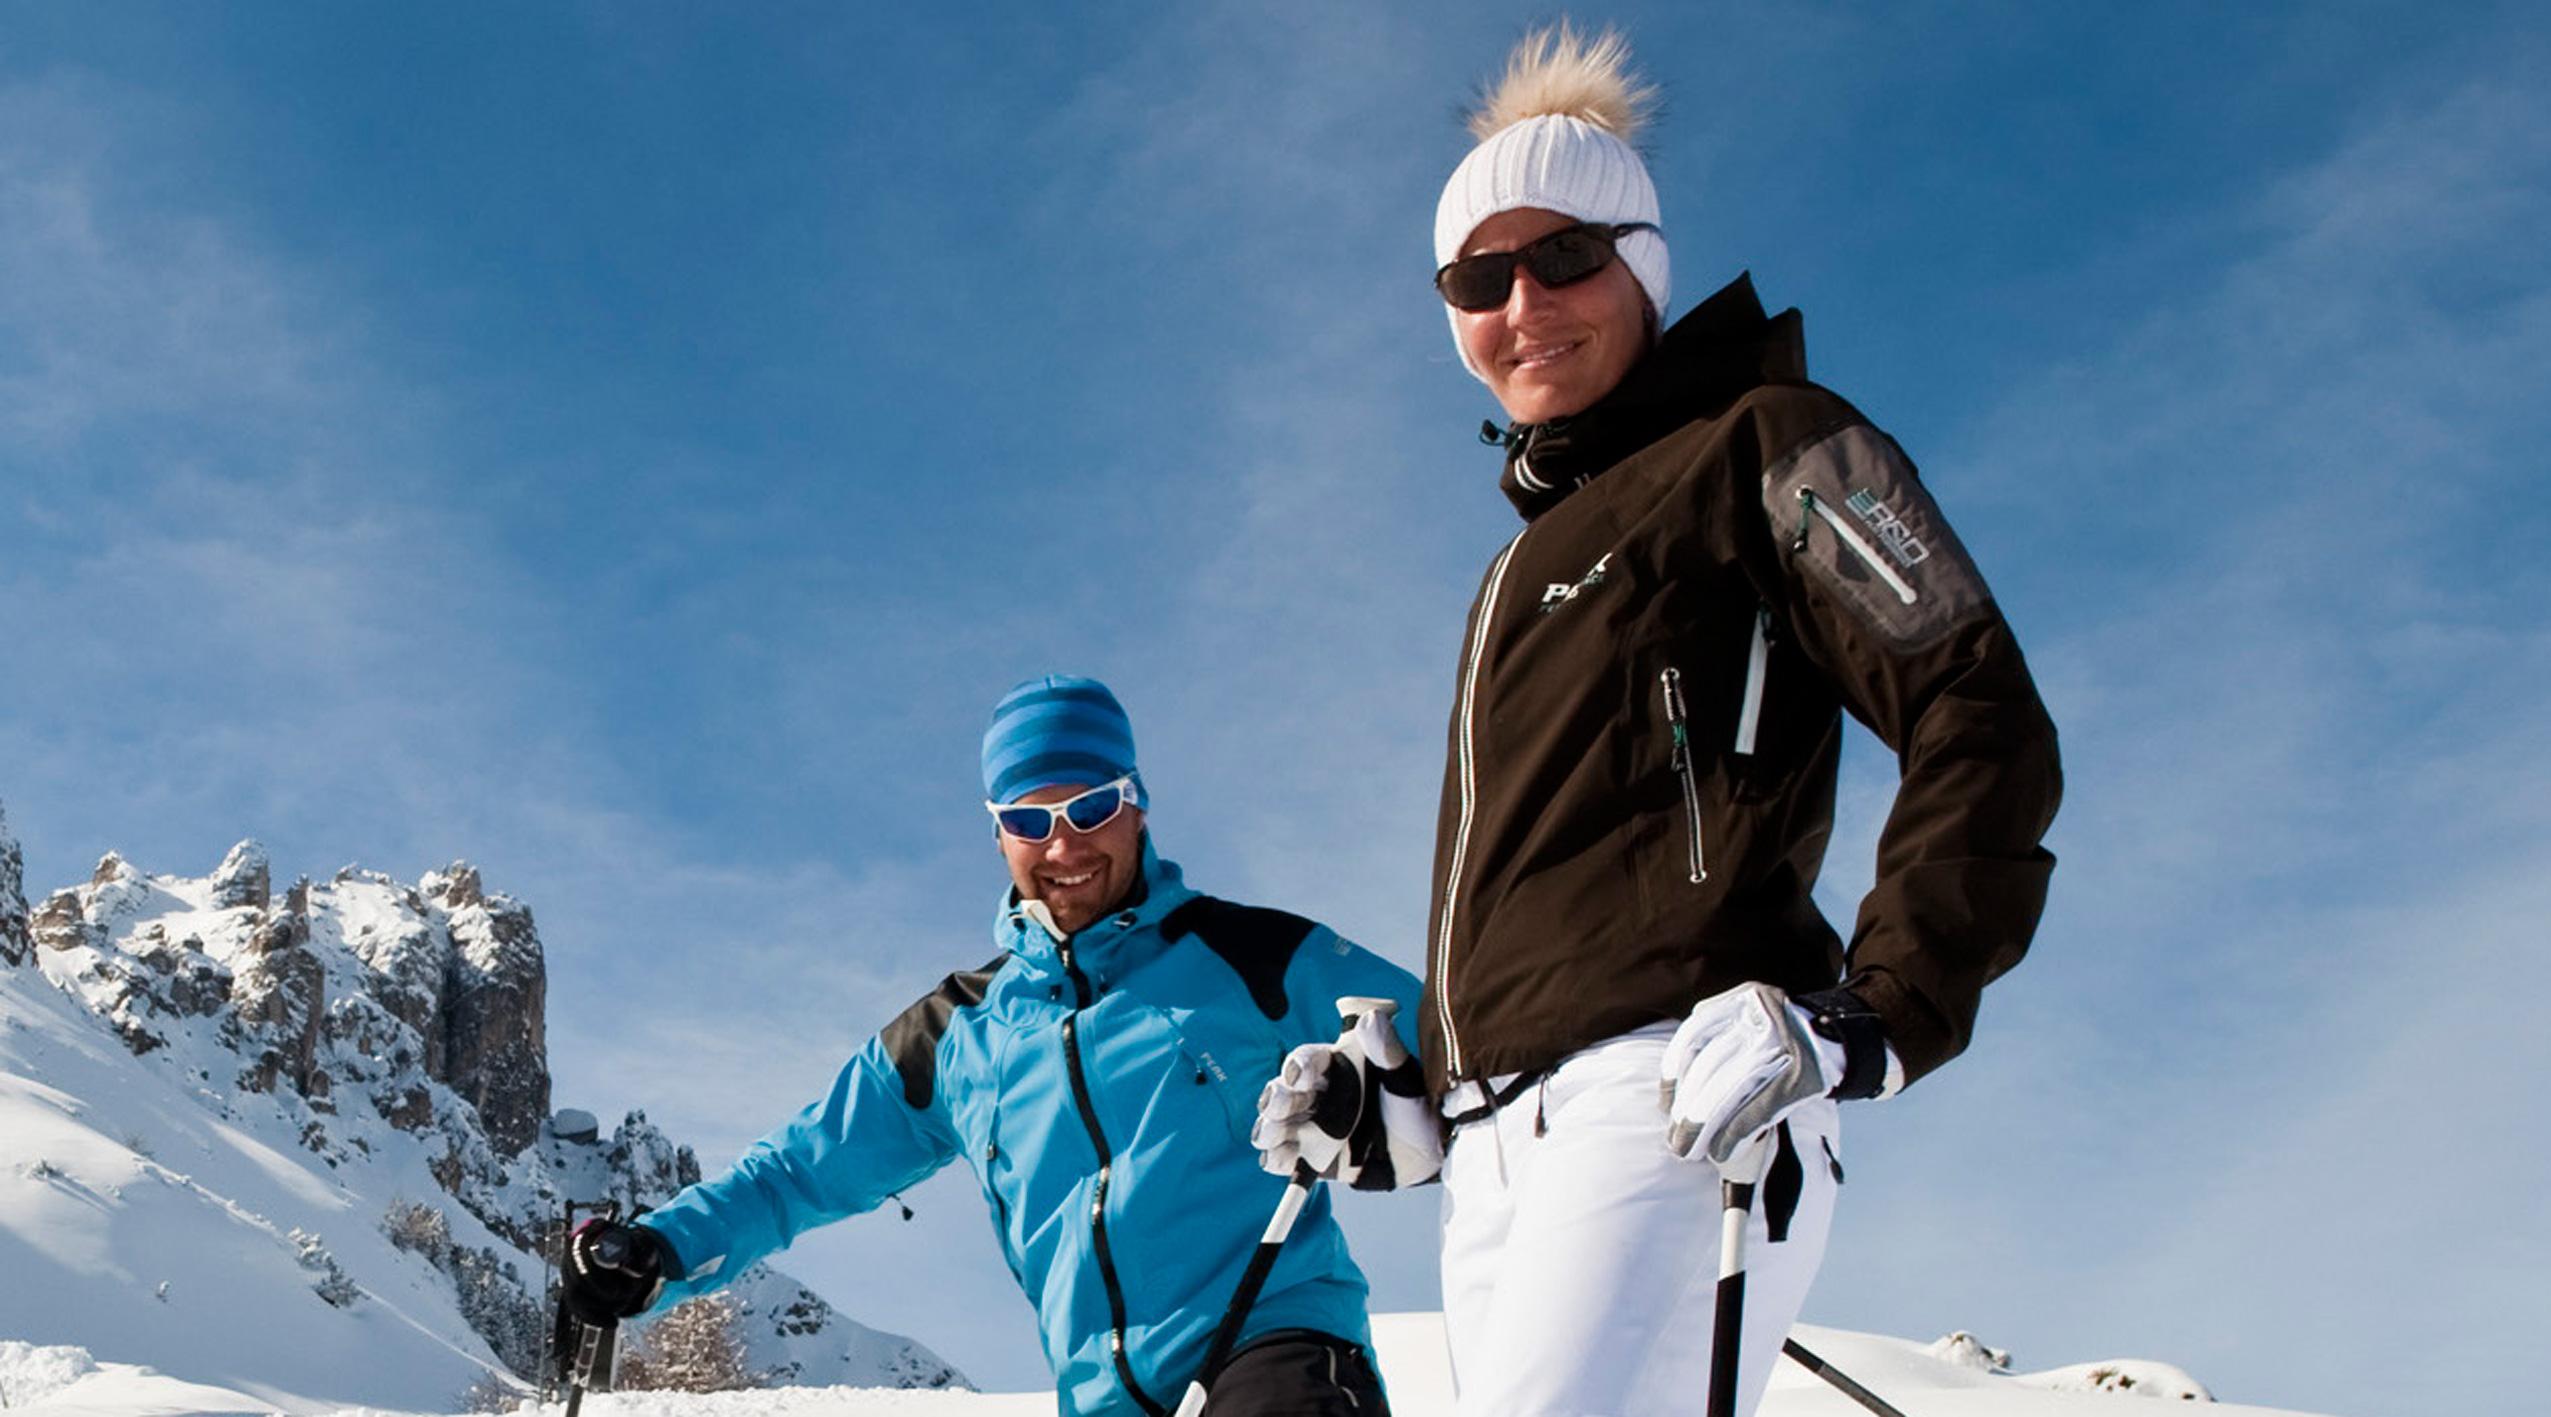 Sezon narciarski 2016/17 na lodowcu Stubai